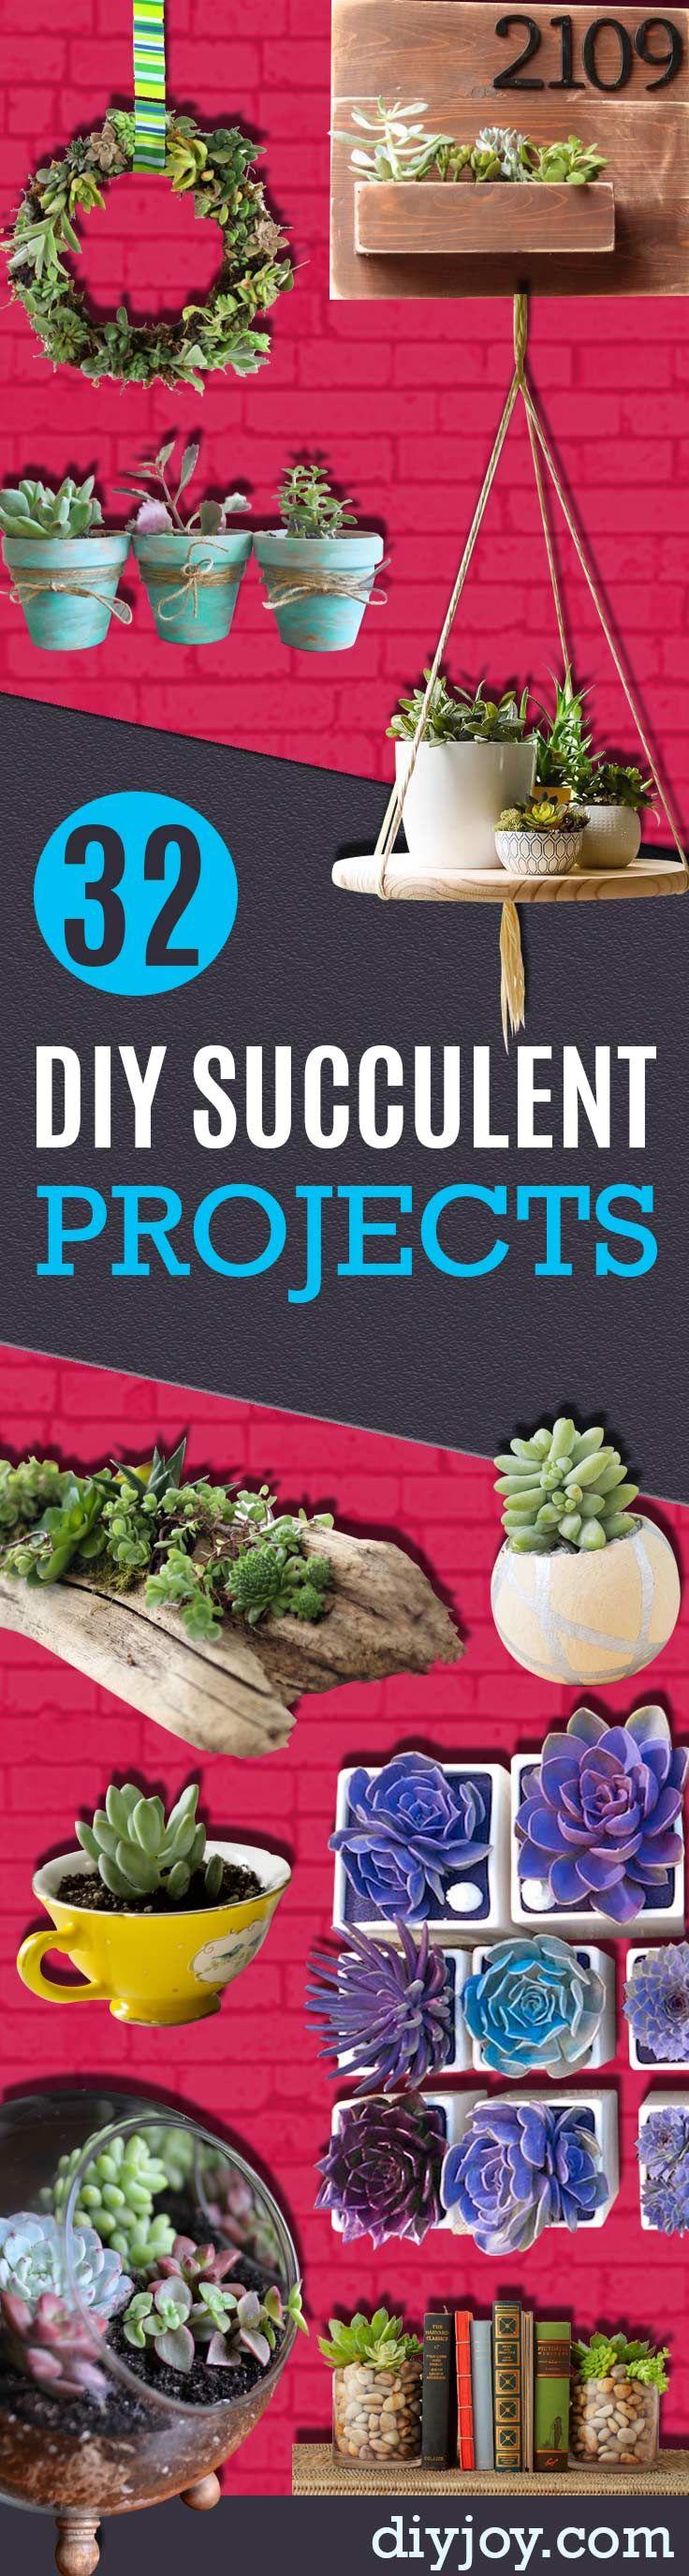 Succulents Crafts and DIY Projects - How To Make Fun, Beautiful and Cool Succulent Cactus Wedding Favors, Centerpieces, Mason Jar Ideas, Flower Pots and Decor http://diyjoy.com/diy-ideas-succulents-crafts